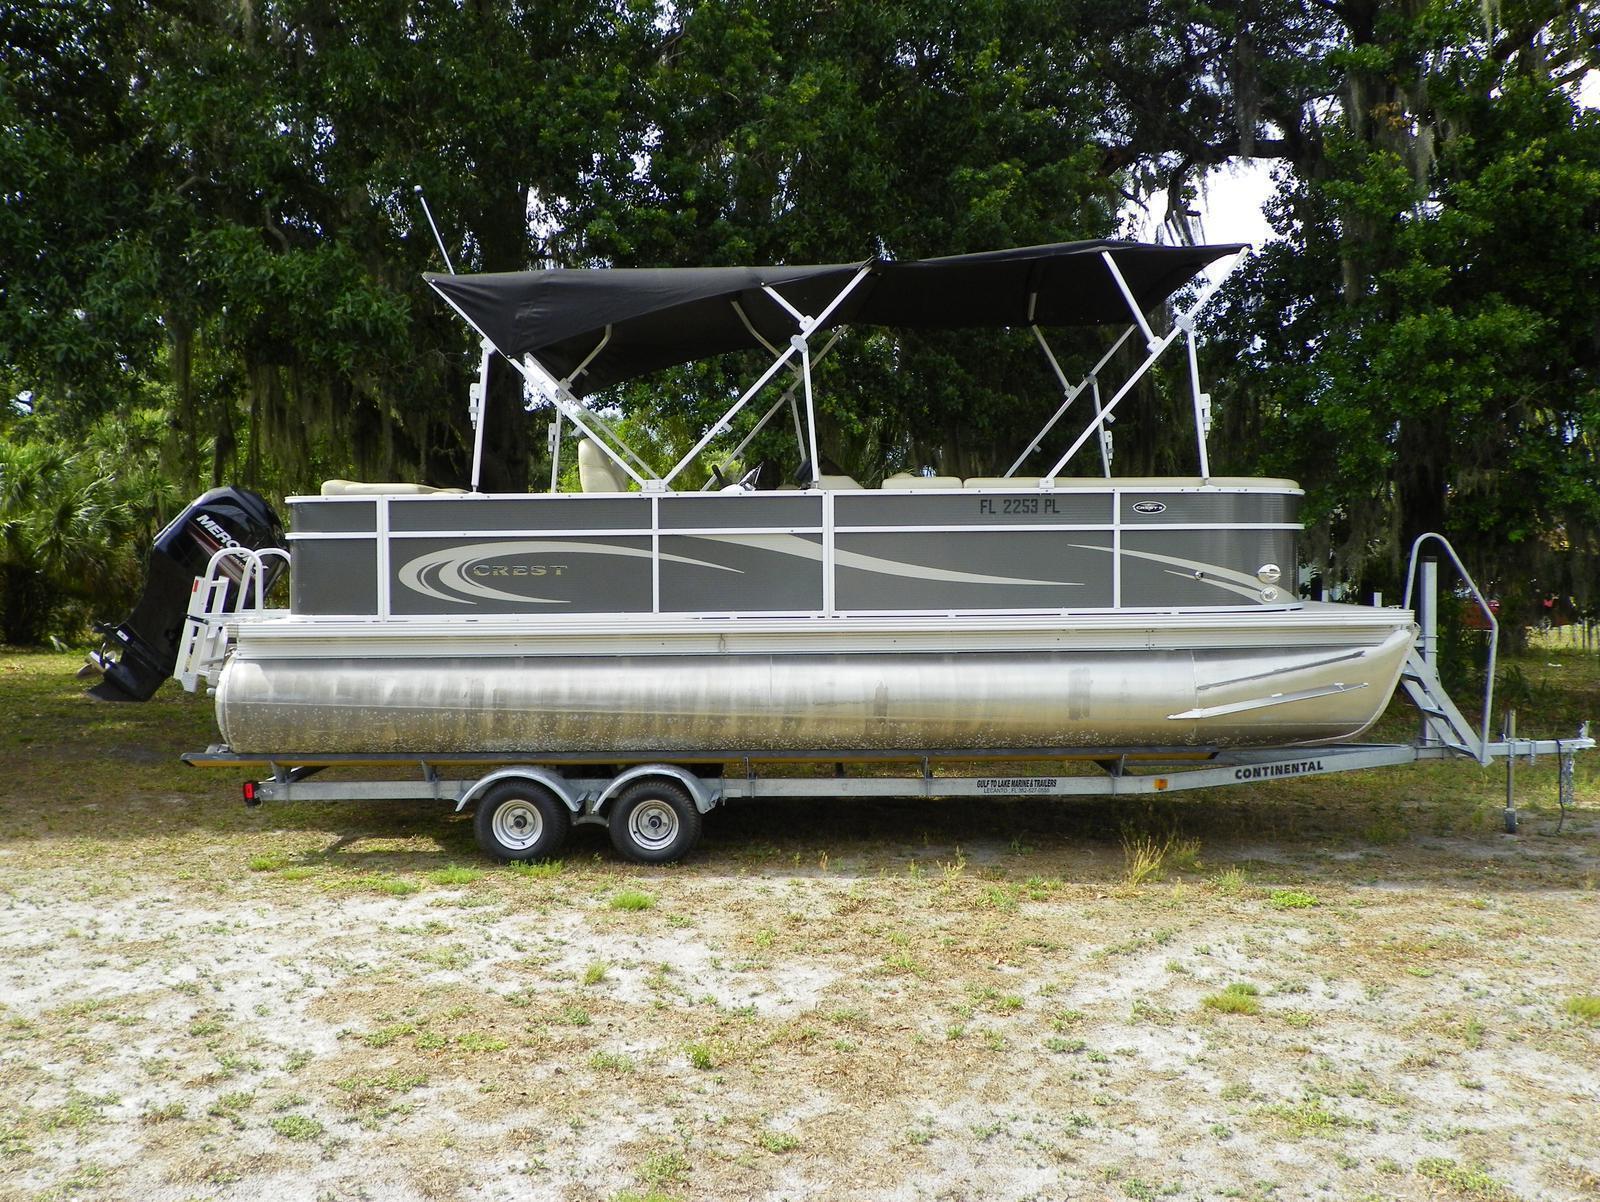 Crest Pontoon Boats 230 CREST II